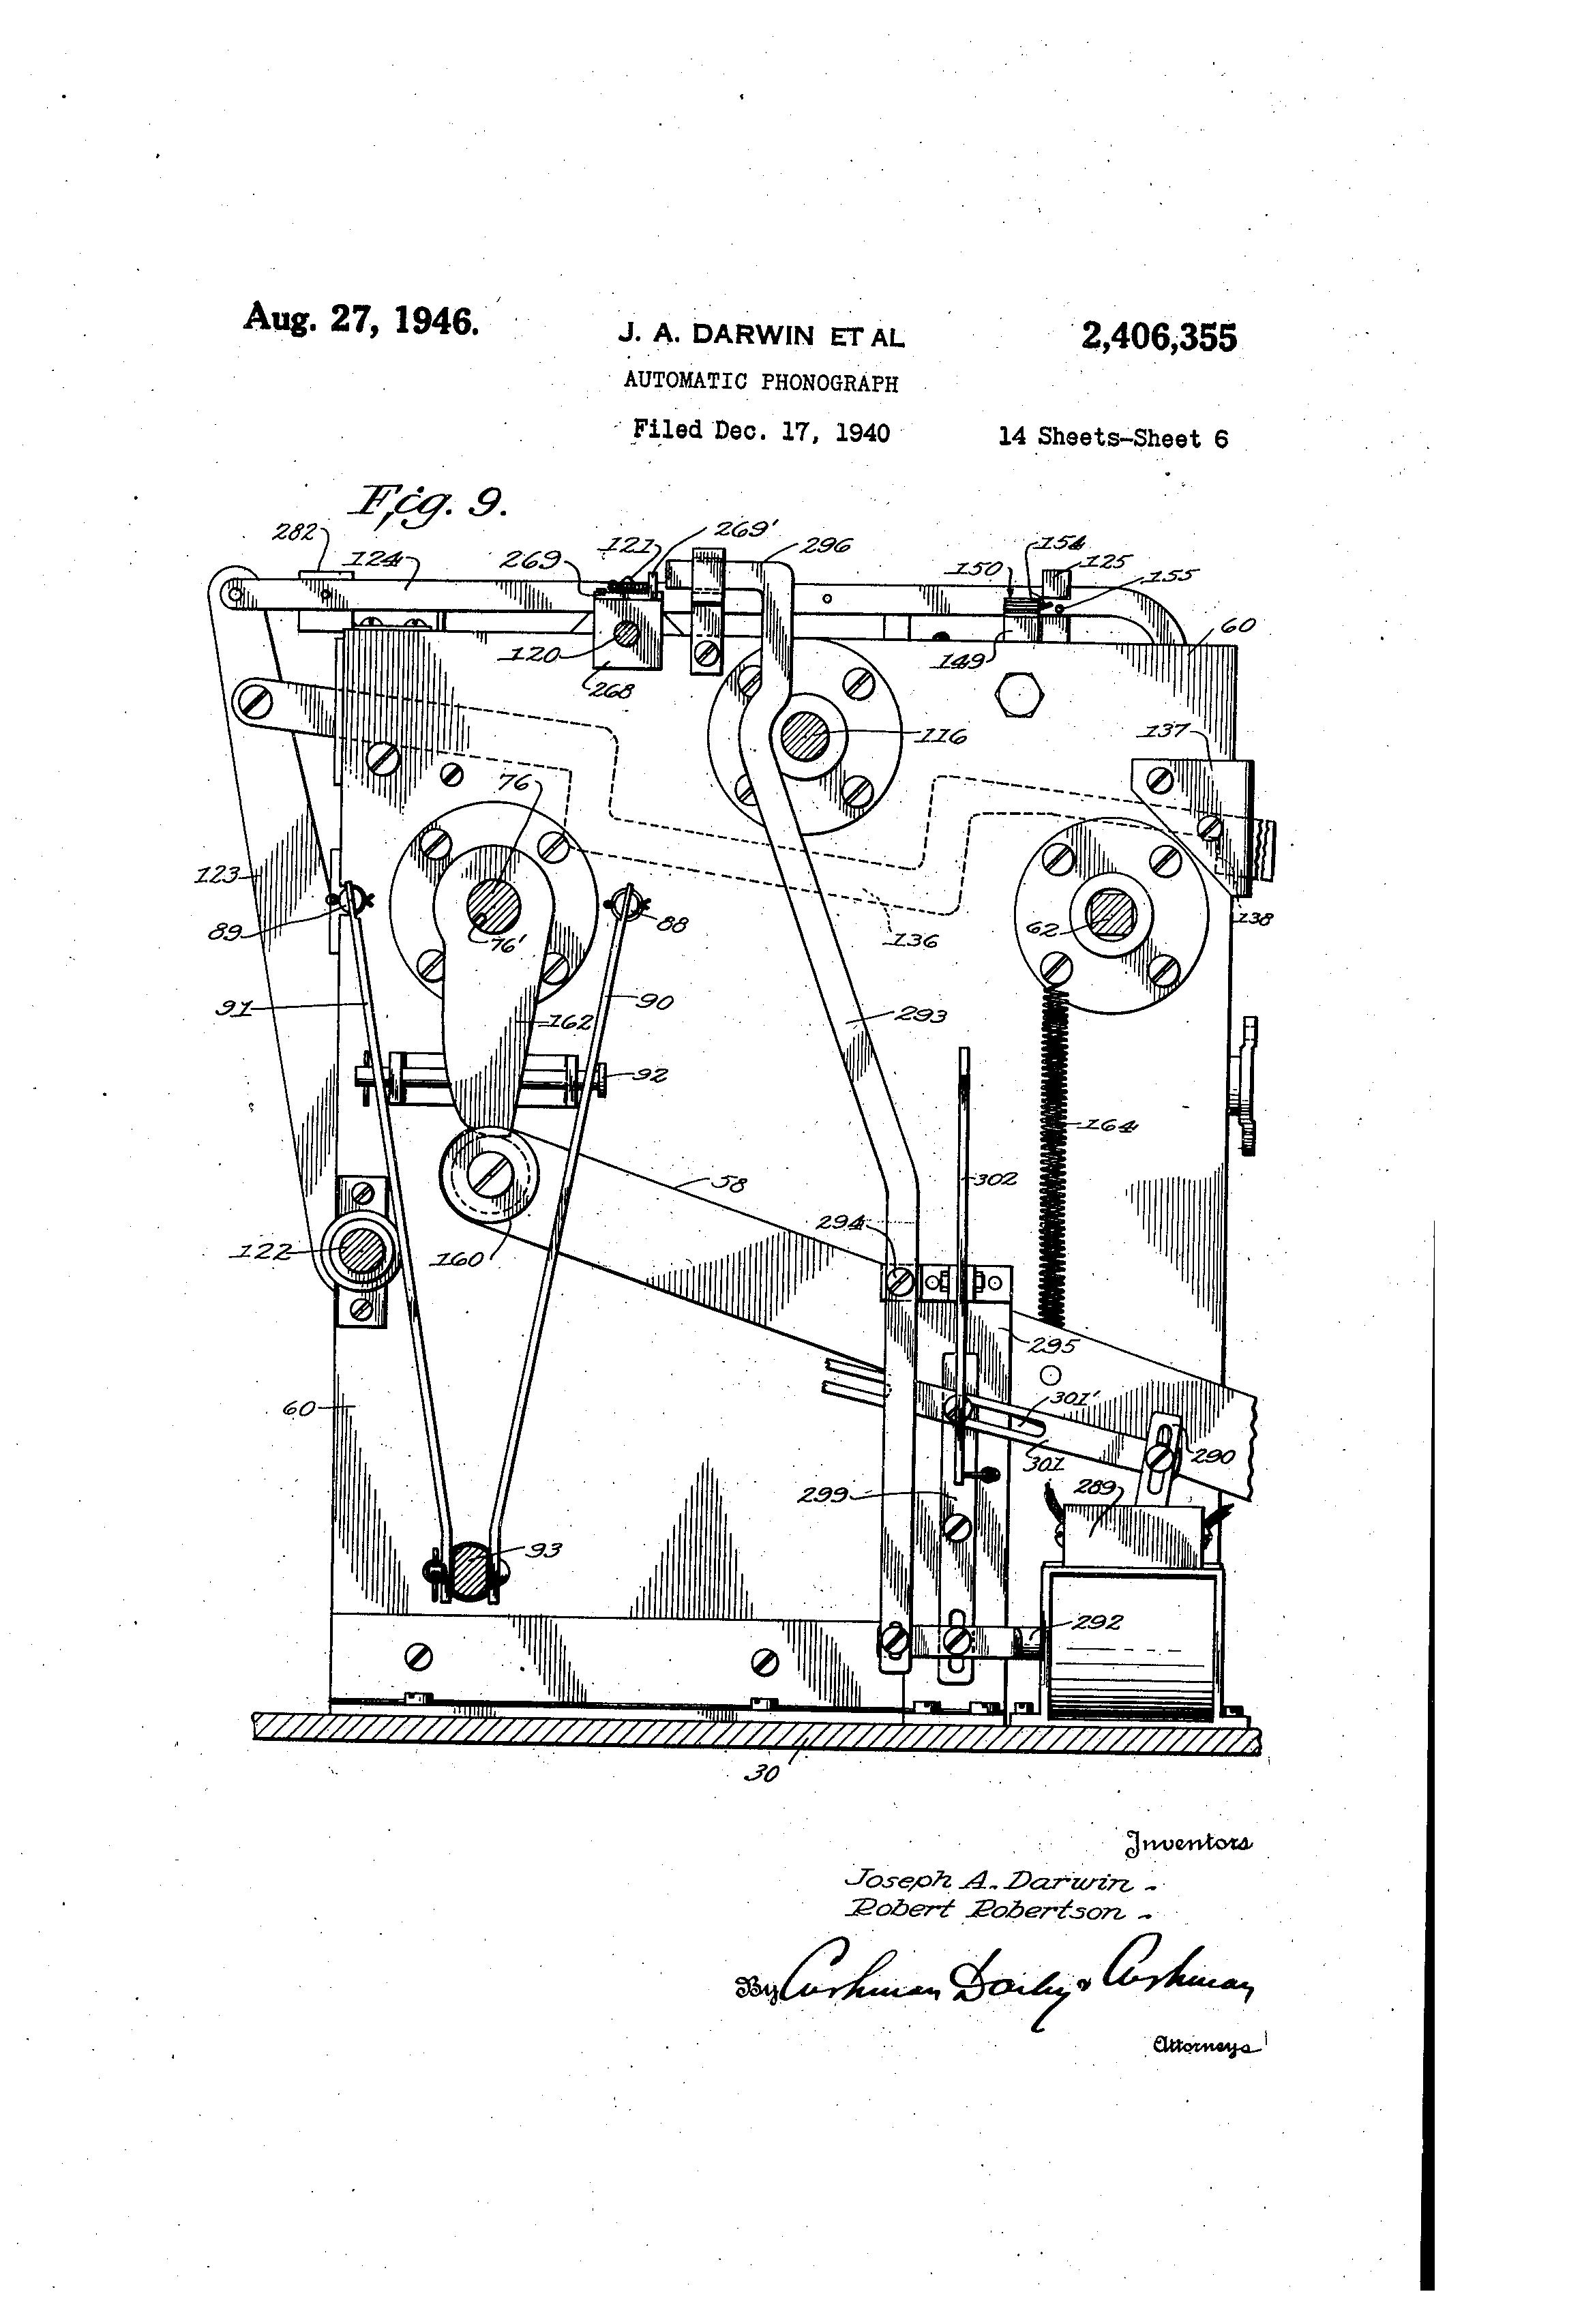 US2406355 5 hub2b wiring diagram \u2022 buccaneersvsrams co  at honlapkeszites.co